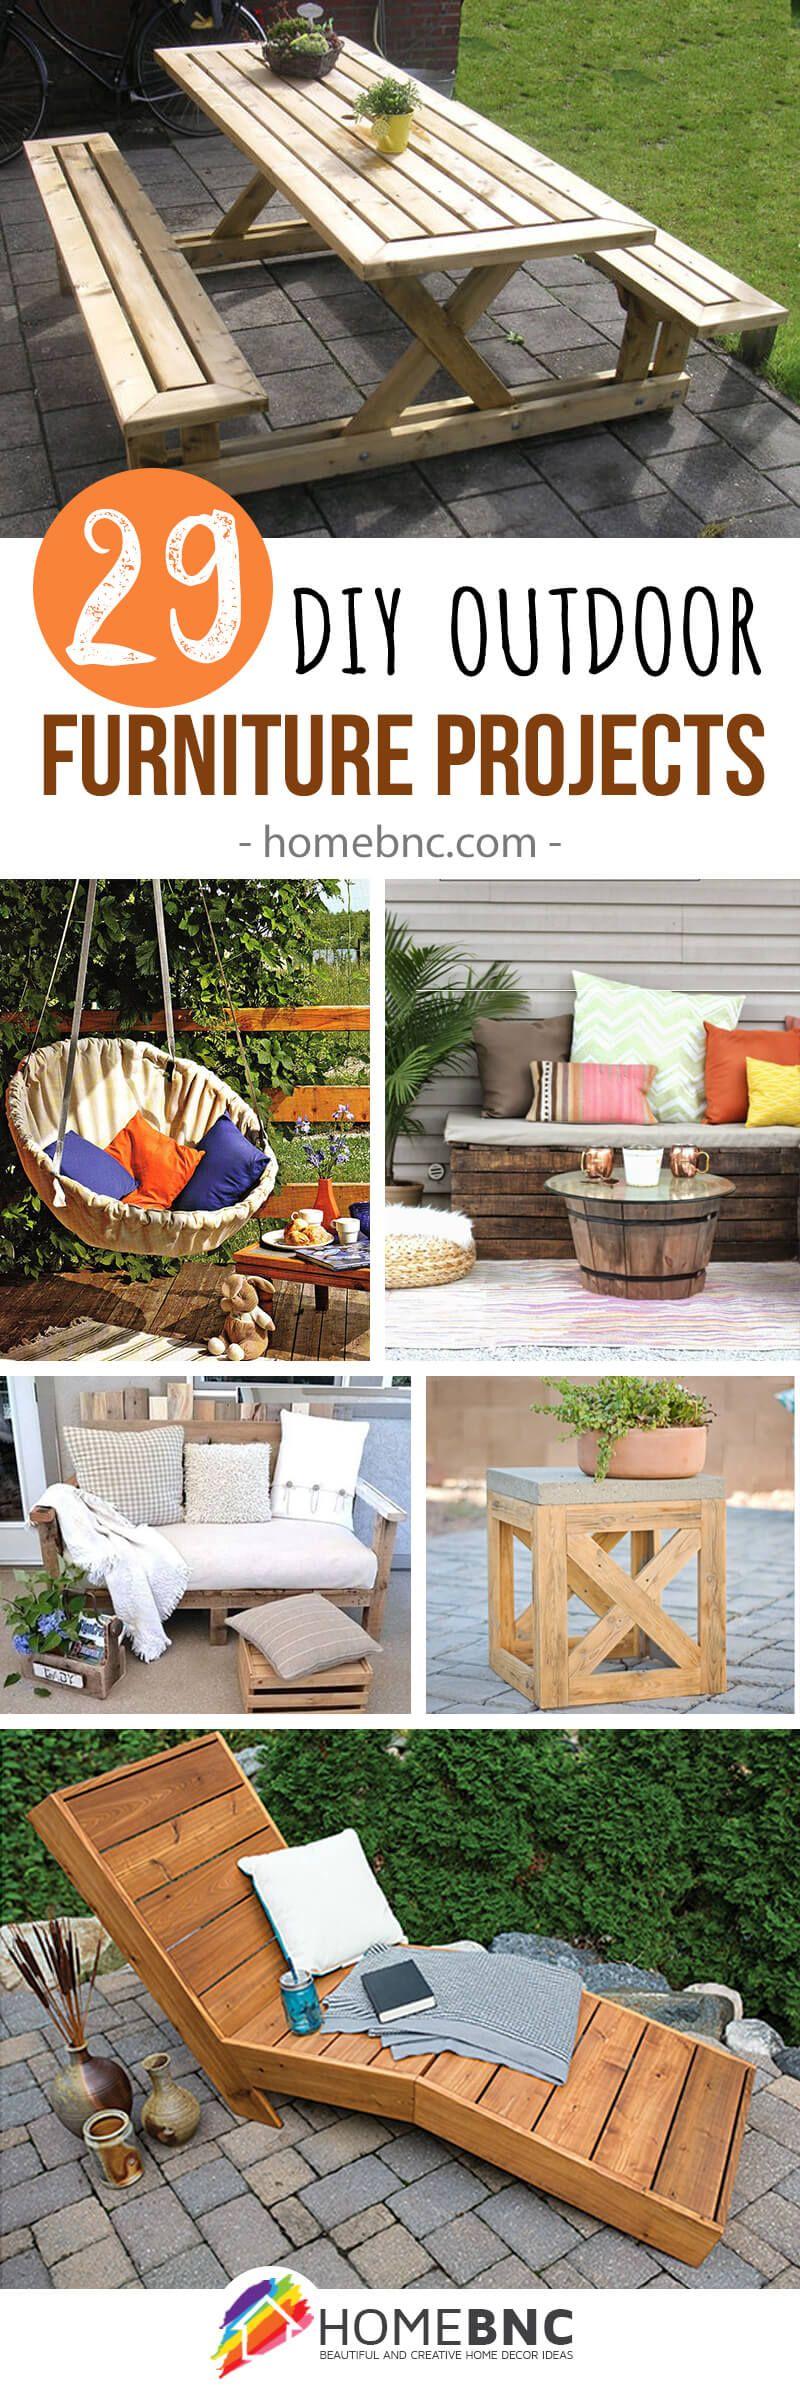 outdoor deck furniture ideas pallet home diy outdoor furniture ideas 29 projects to beautify your space